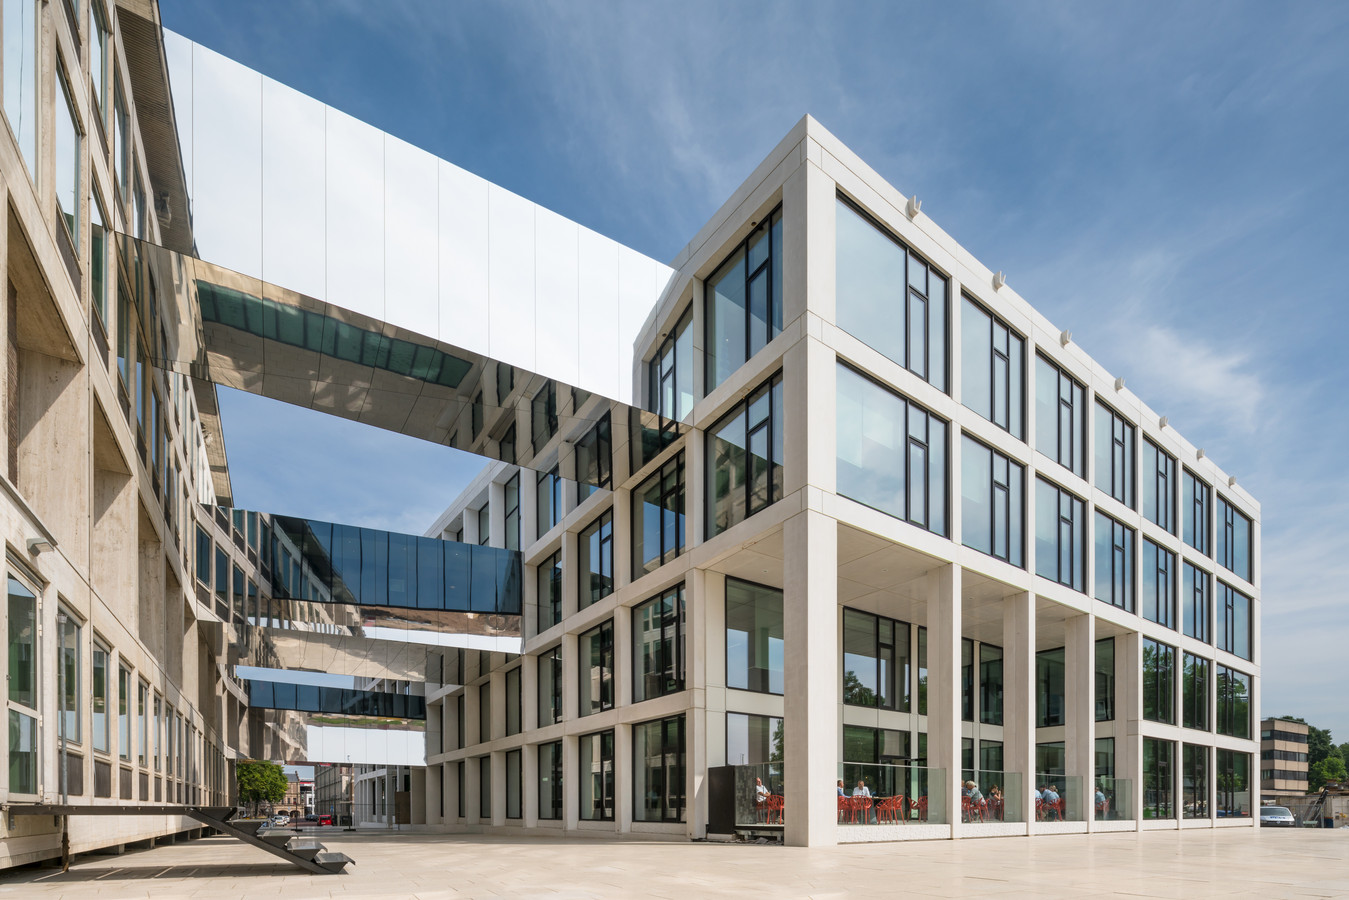 Team V Architectuur.Dag Van De Architectuur Arnhem Rond Beste Gebouw Van